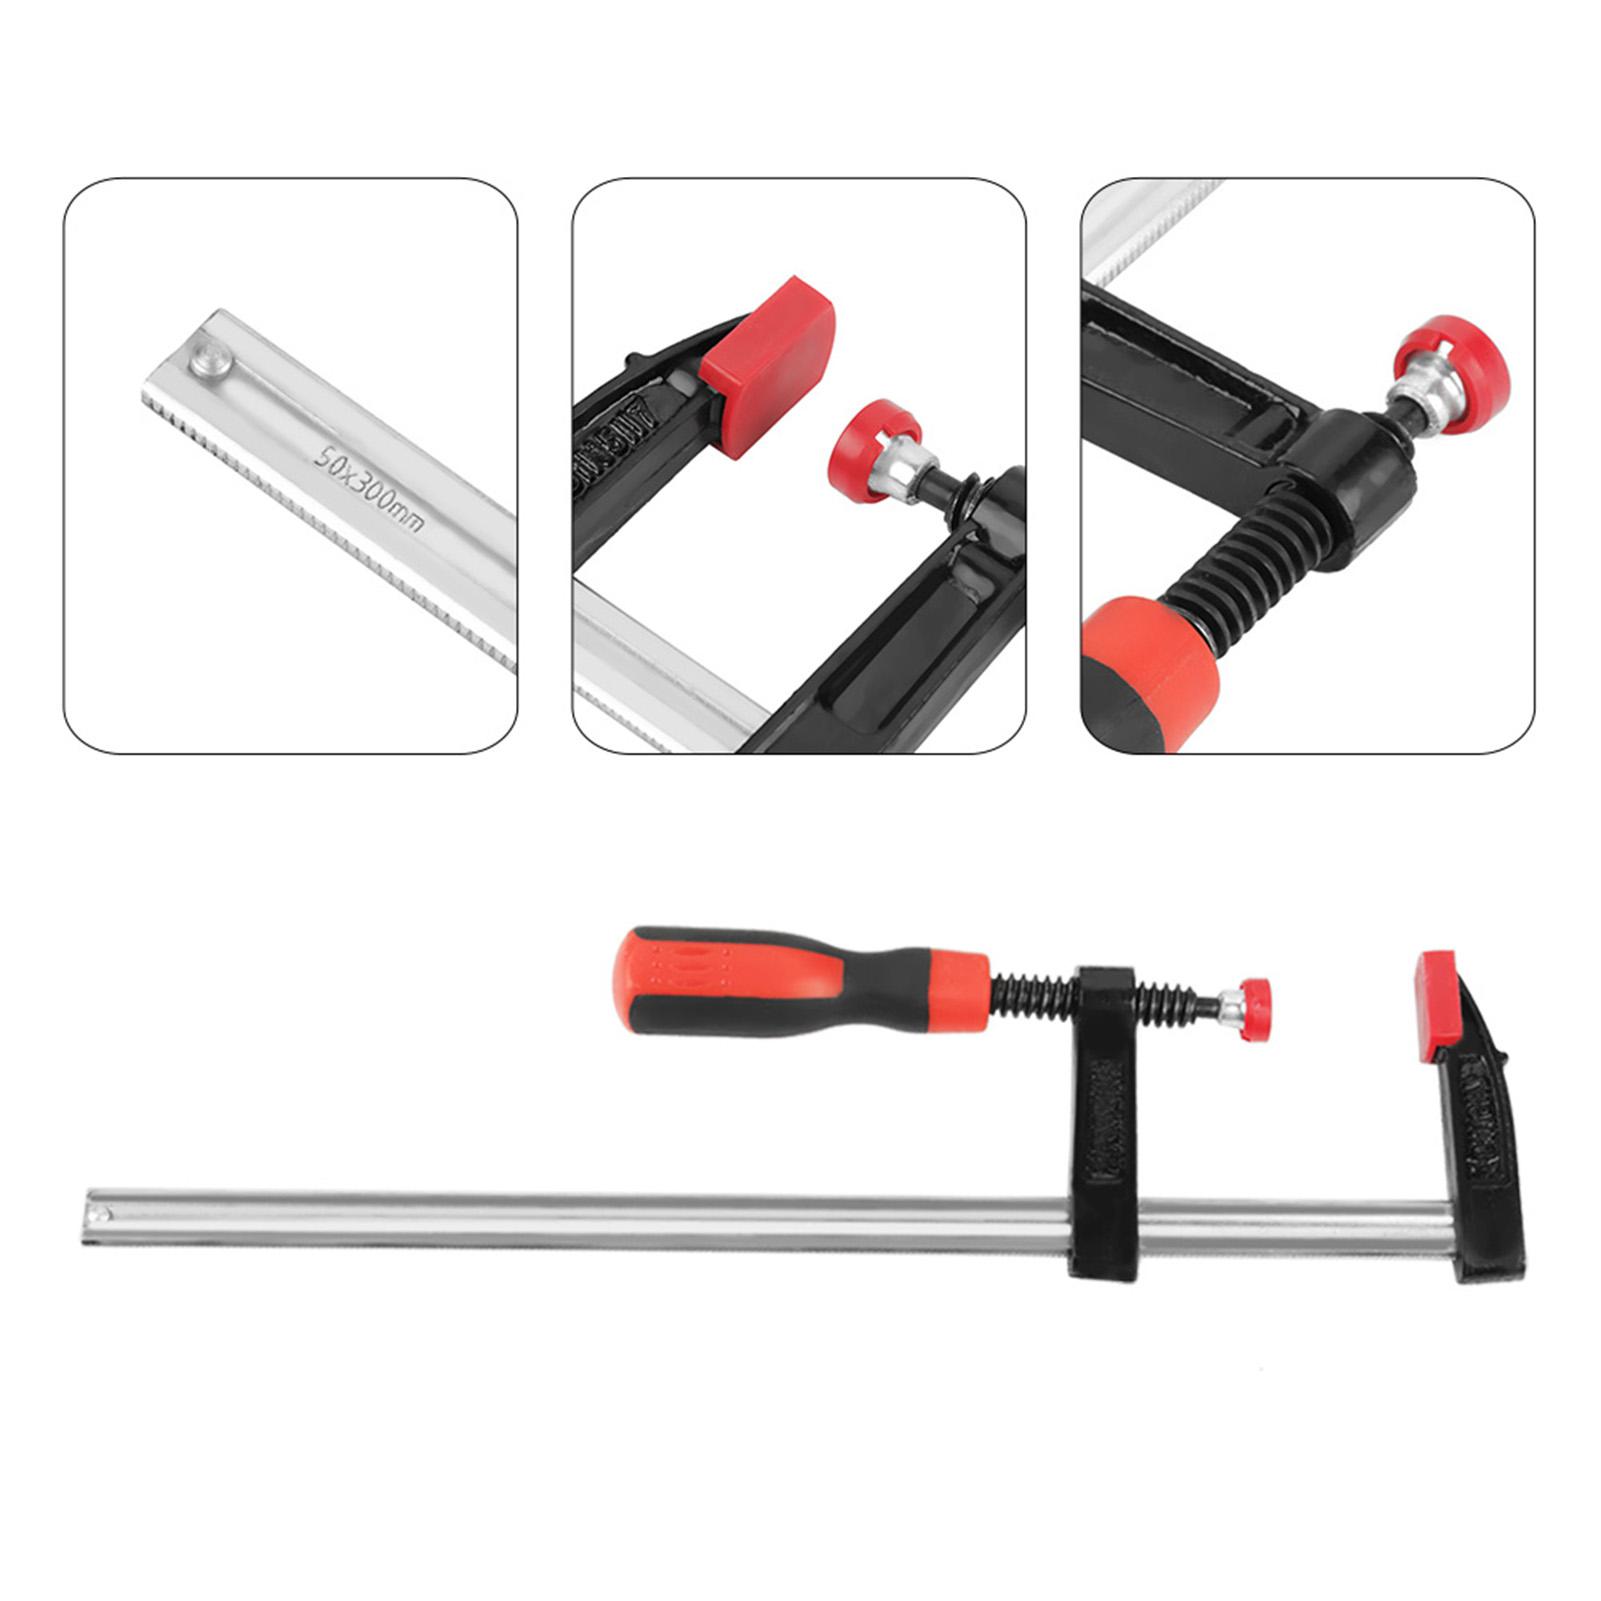 4x 50x300mm F Woodworking Clip Quick Plastic Grip Clamp Wood Carpenter Vice Tool